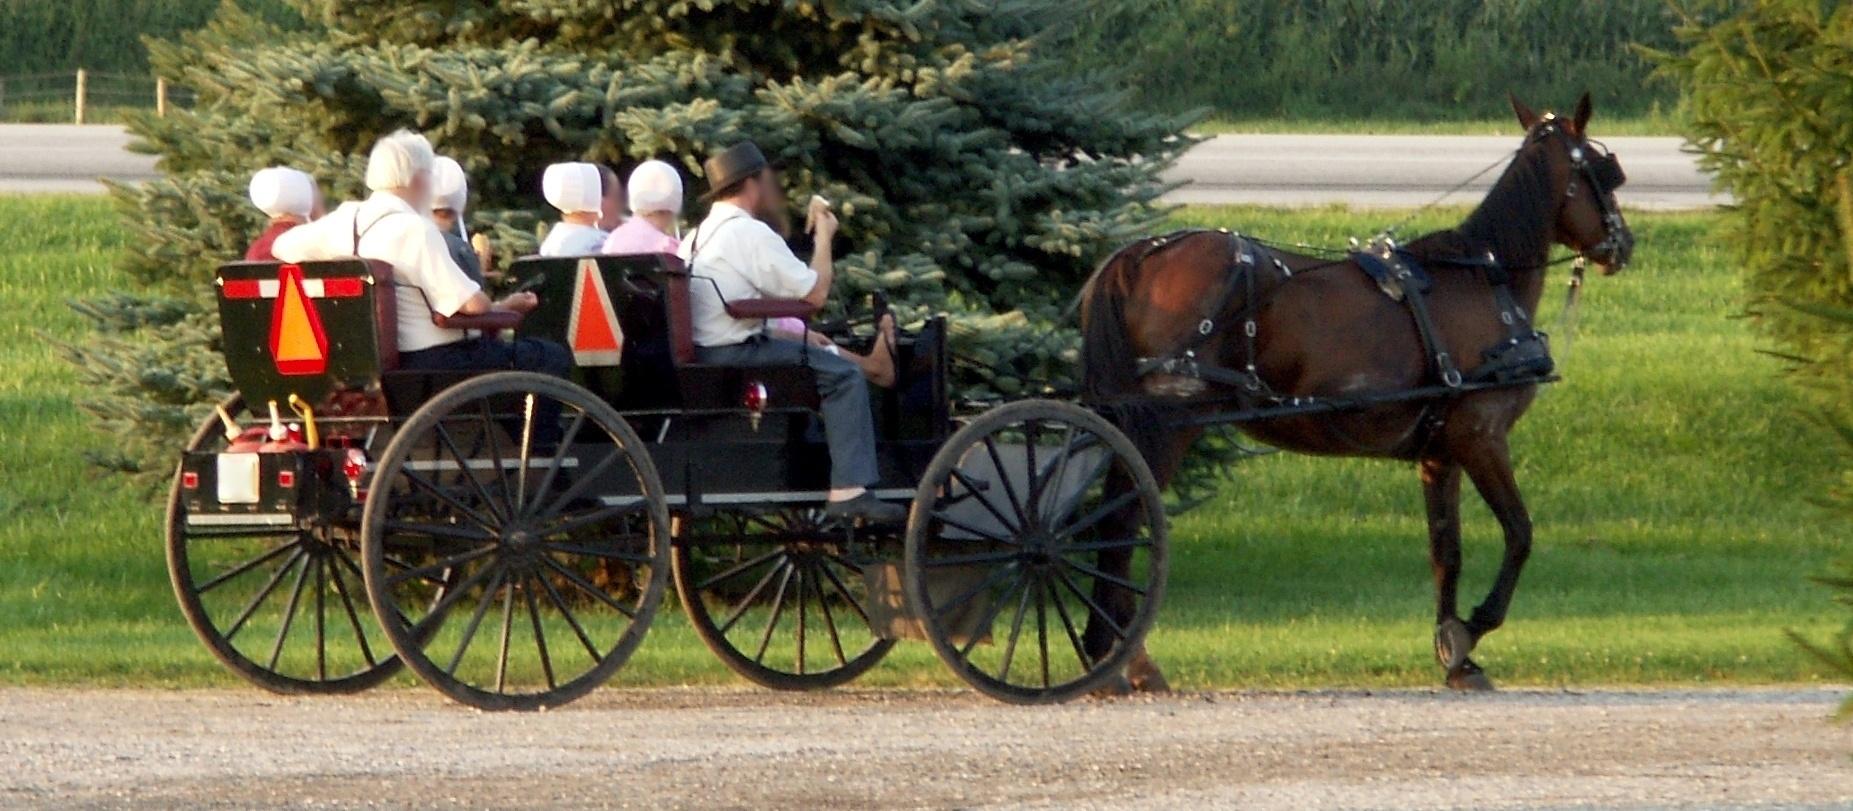 Amish_people